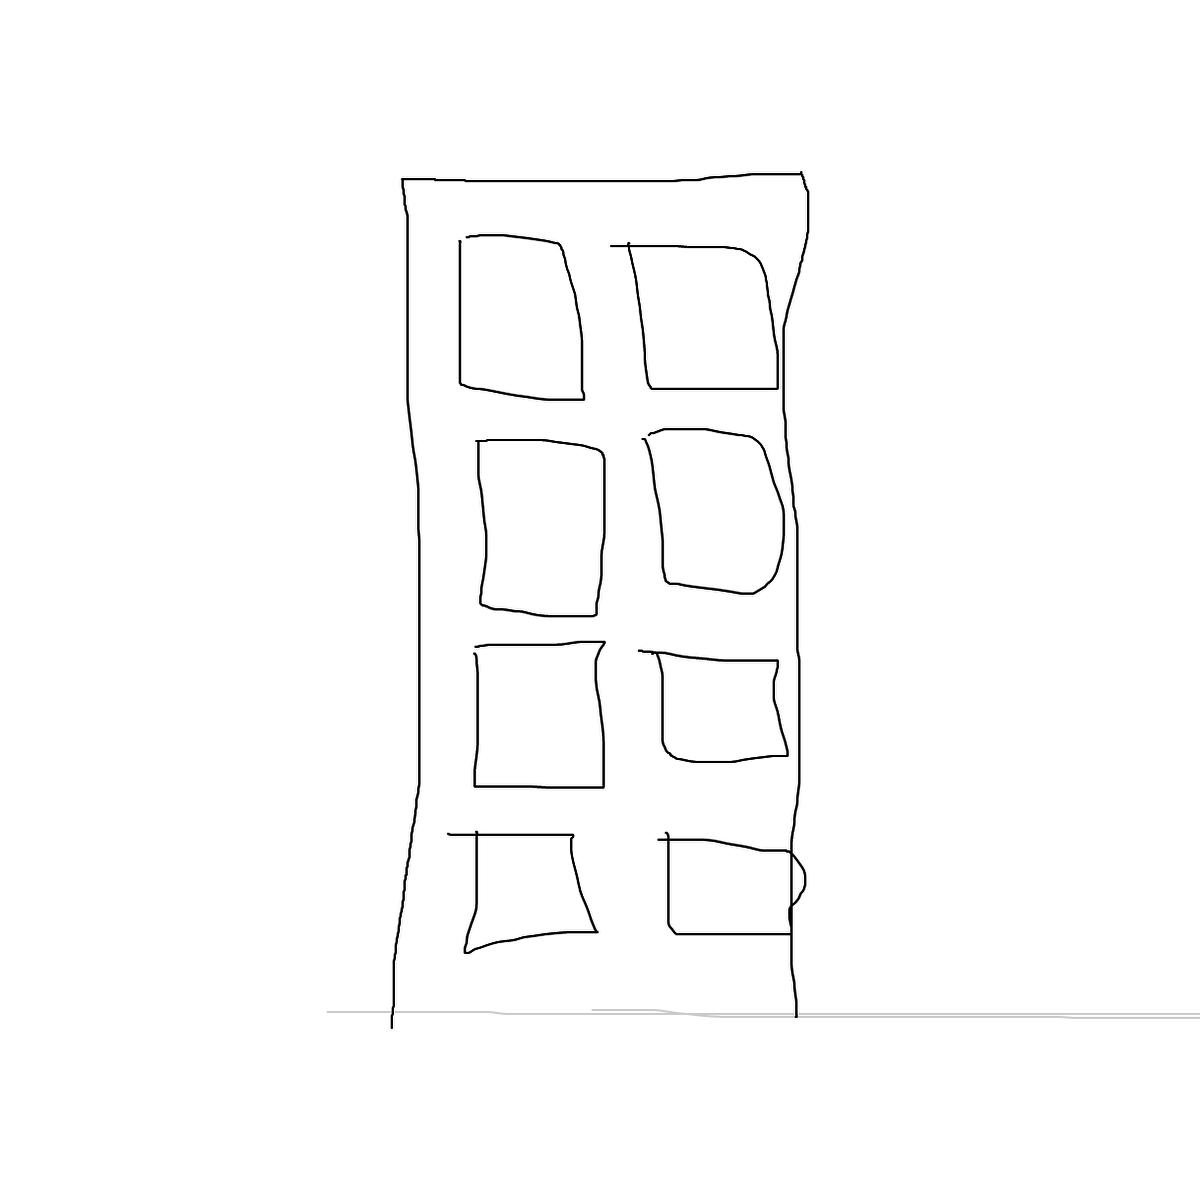 BAAAM drawing#15132 lat:-32.2596015930175800lng: 148.6463012695312500